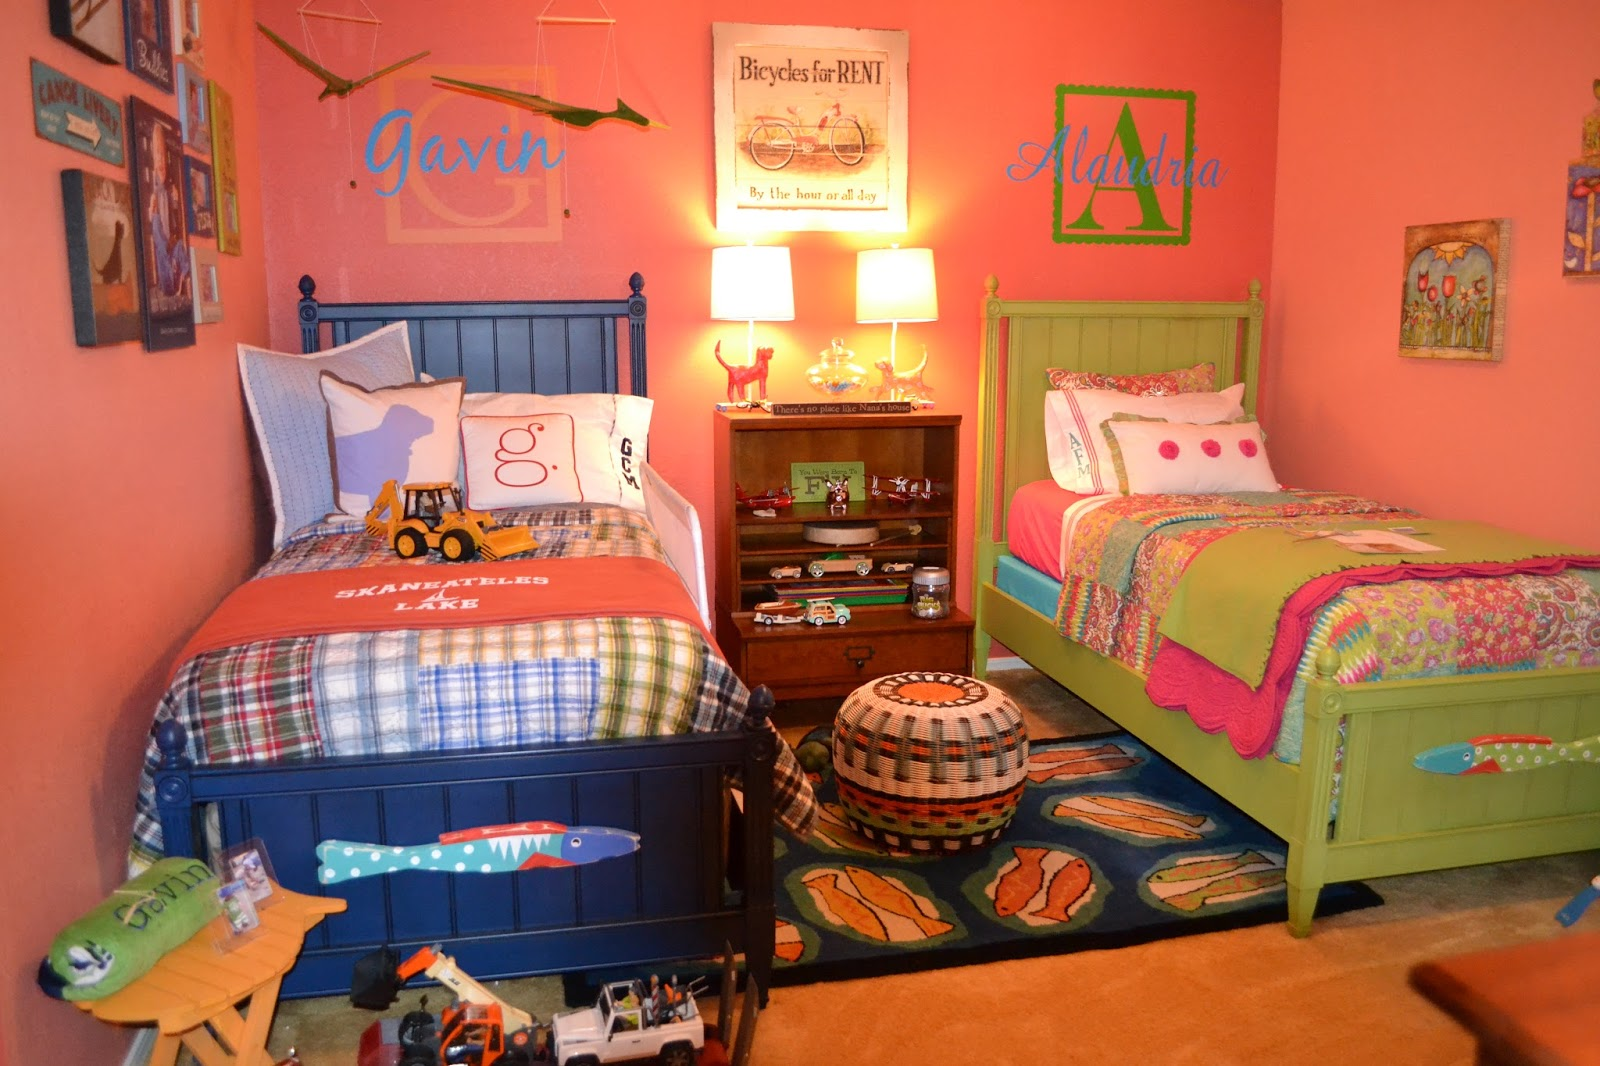 صور لديكورات غرف نوم مشتركة